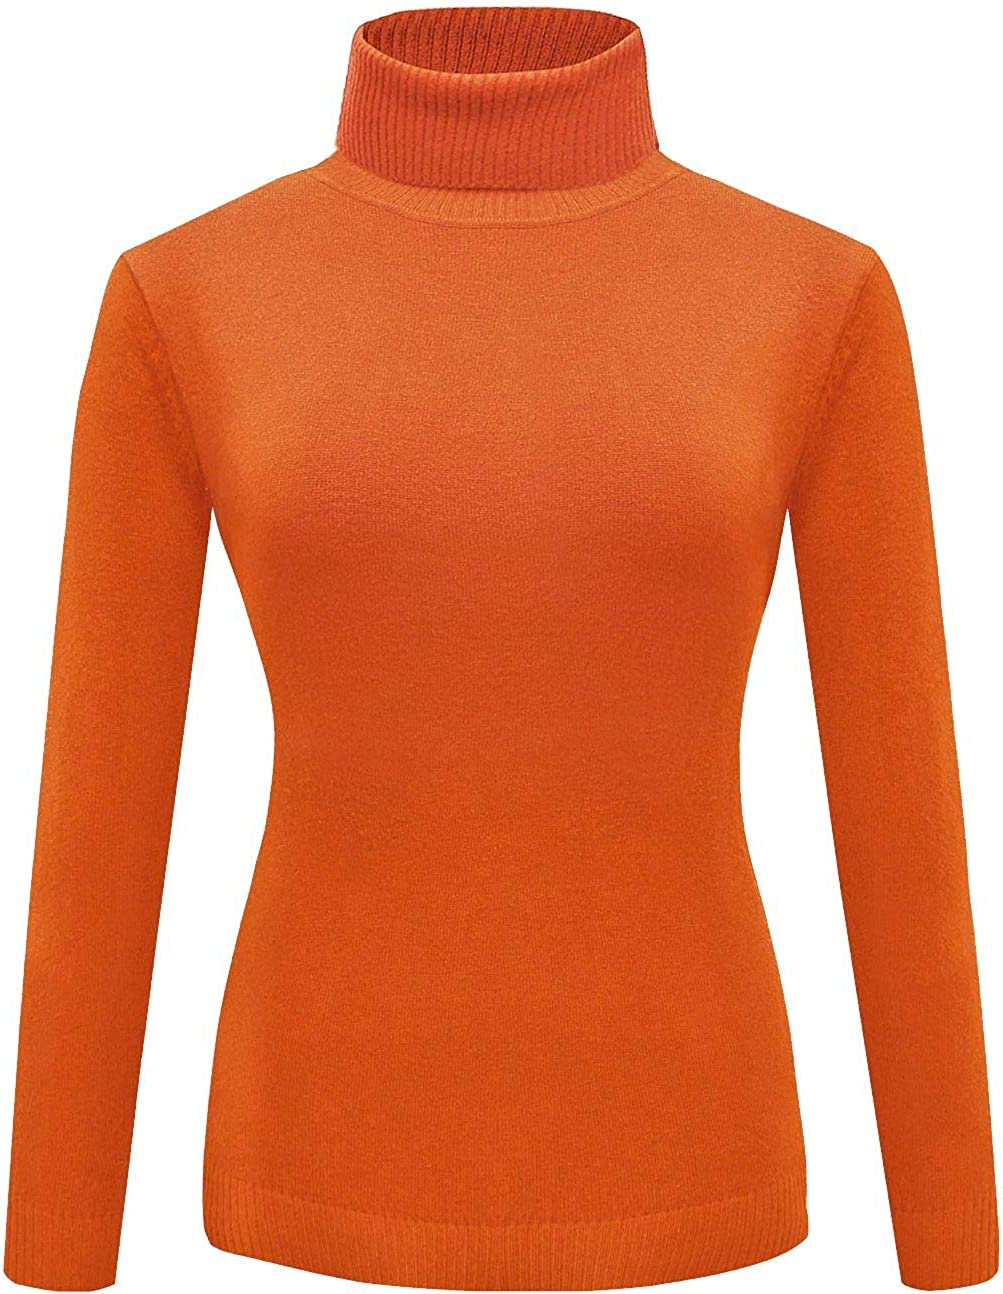 For G and PL Womens Halloween Velma Costume Orange Solid Turtleneck Knitted Sweatshirt